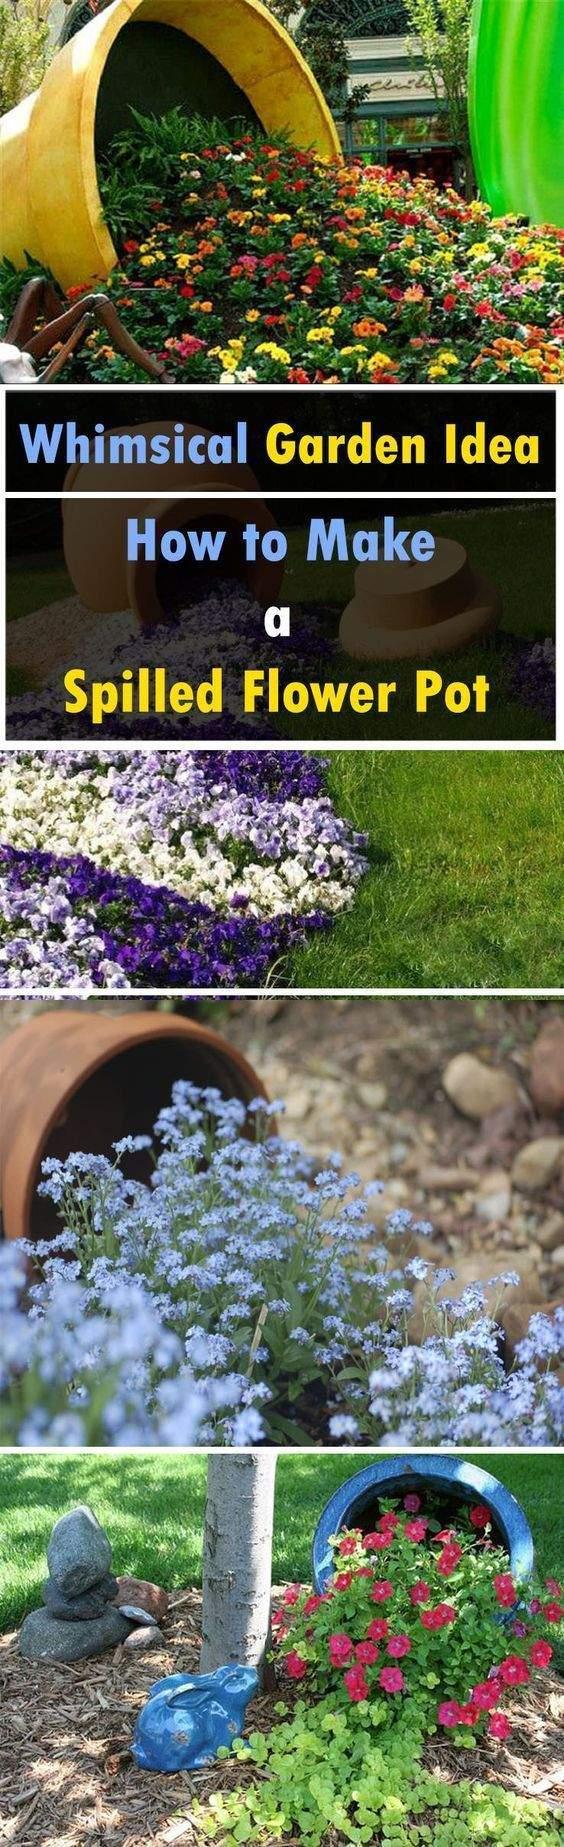 Garten Versicherung Einzigartig Add A Whim to Your Garden Make A Spilled Flower Pot It